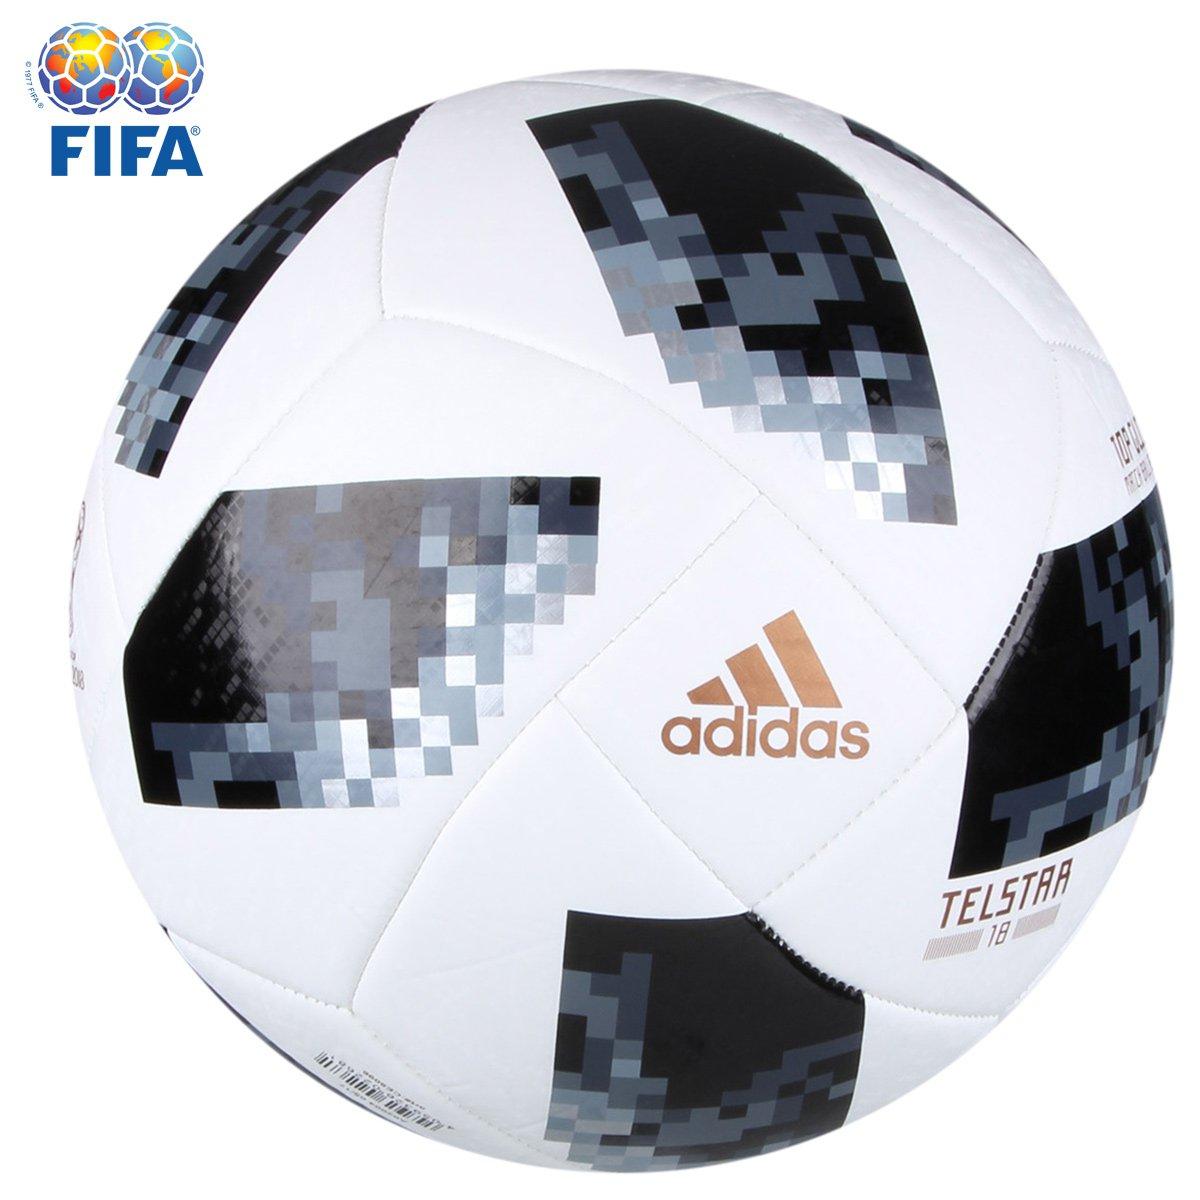 8d56863919 Bola Futebol Campo Adidas Telstar 18 Top Glider Copa do Mundo FIFA